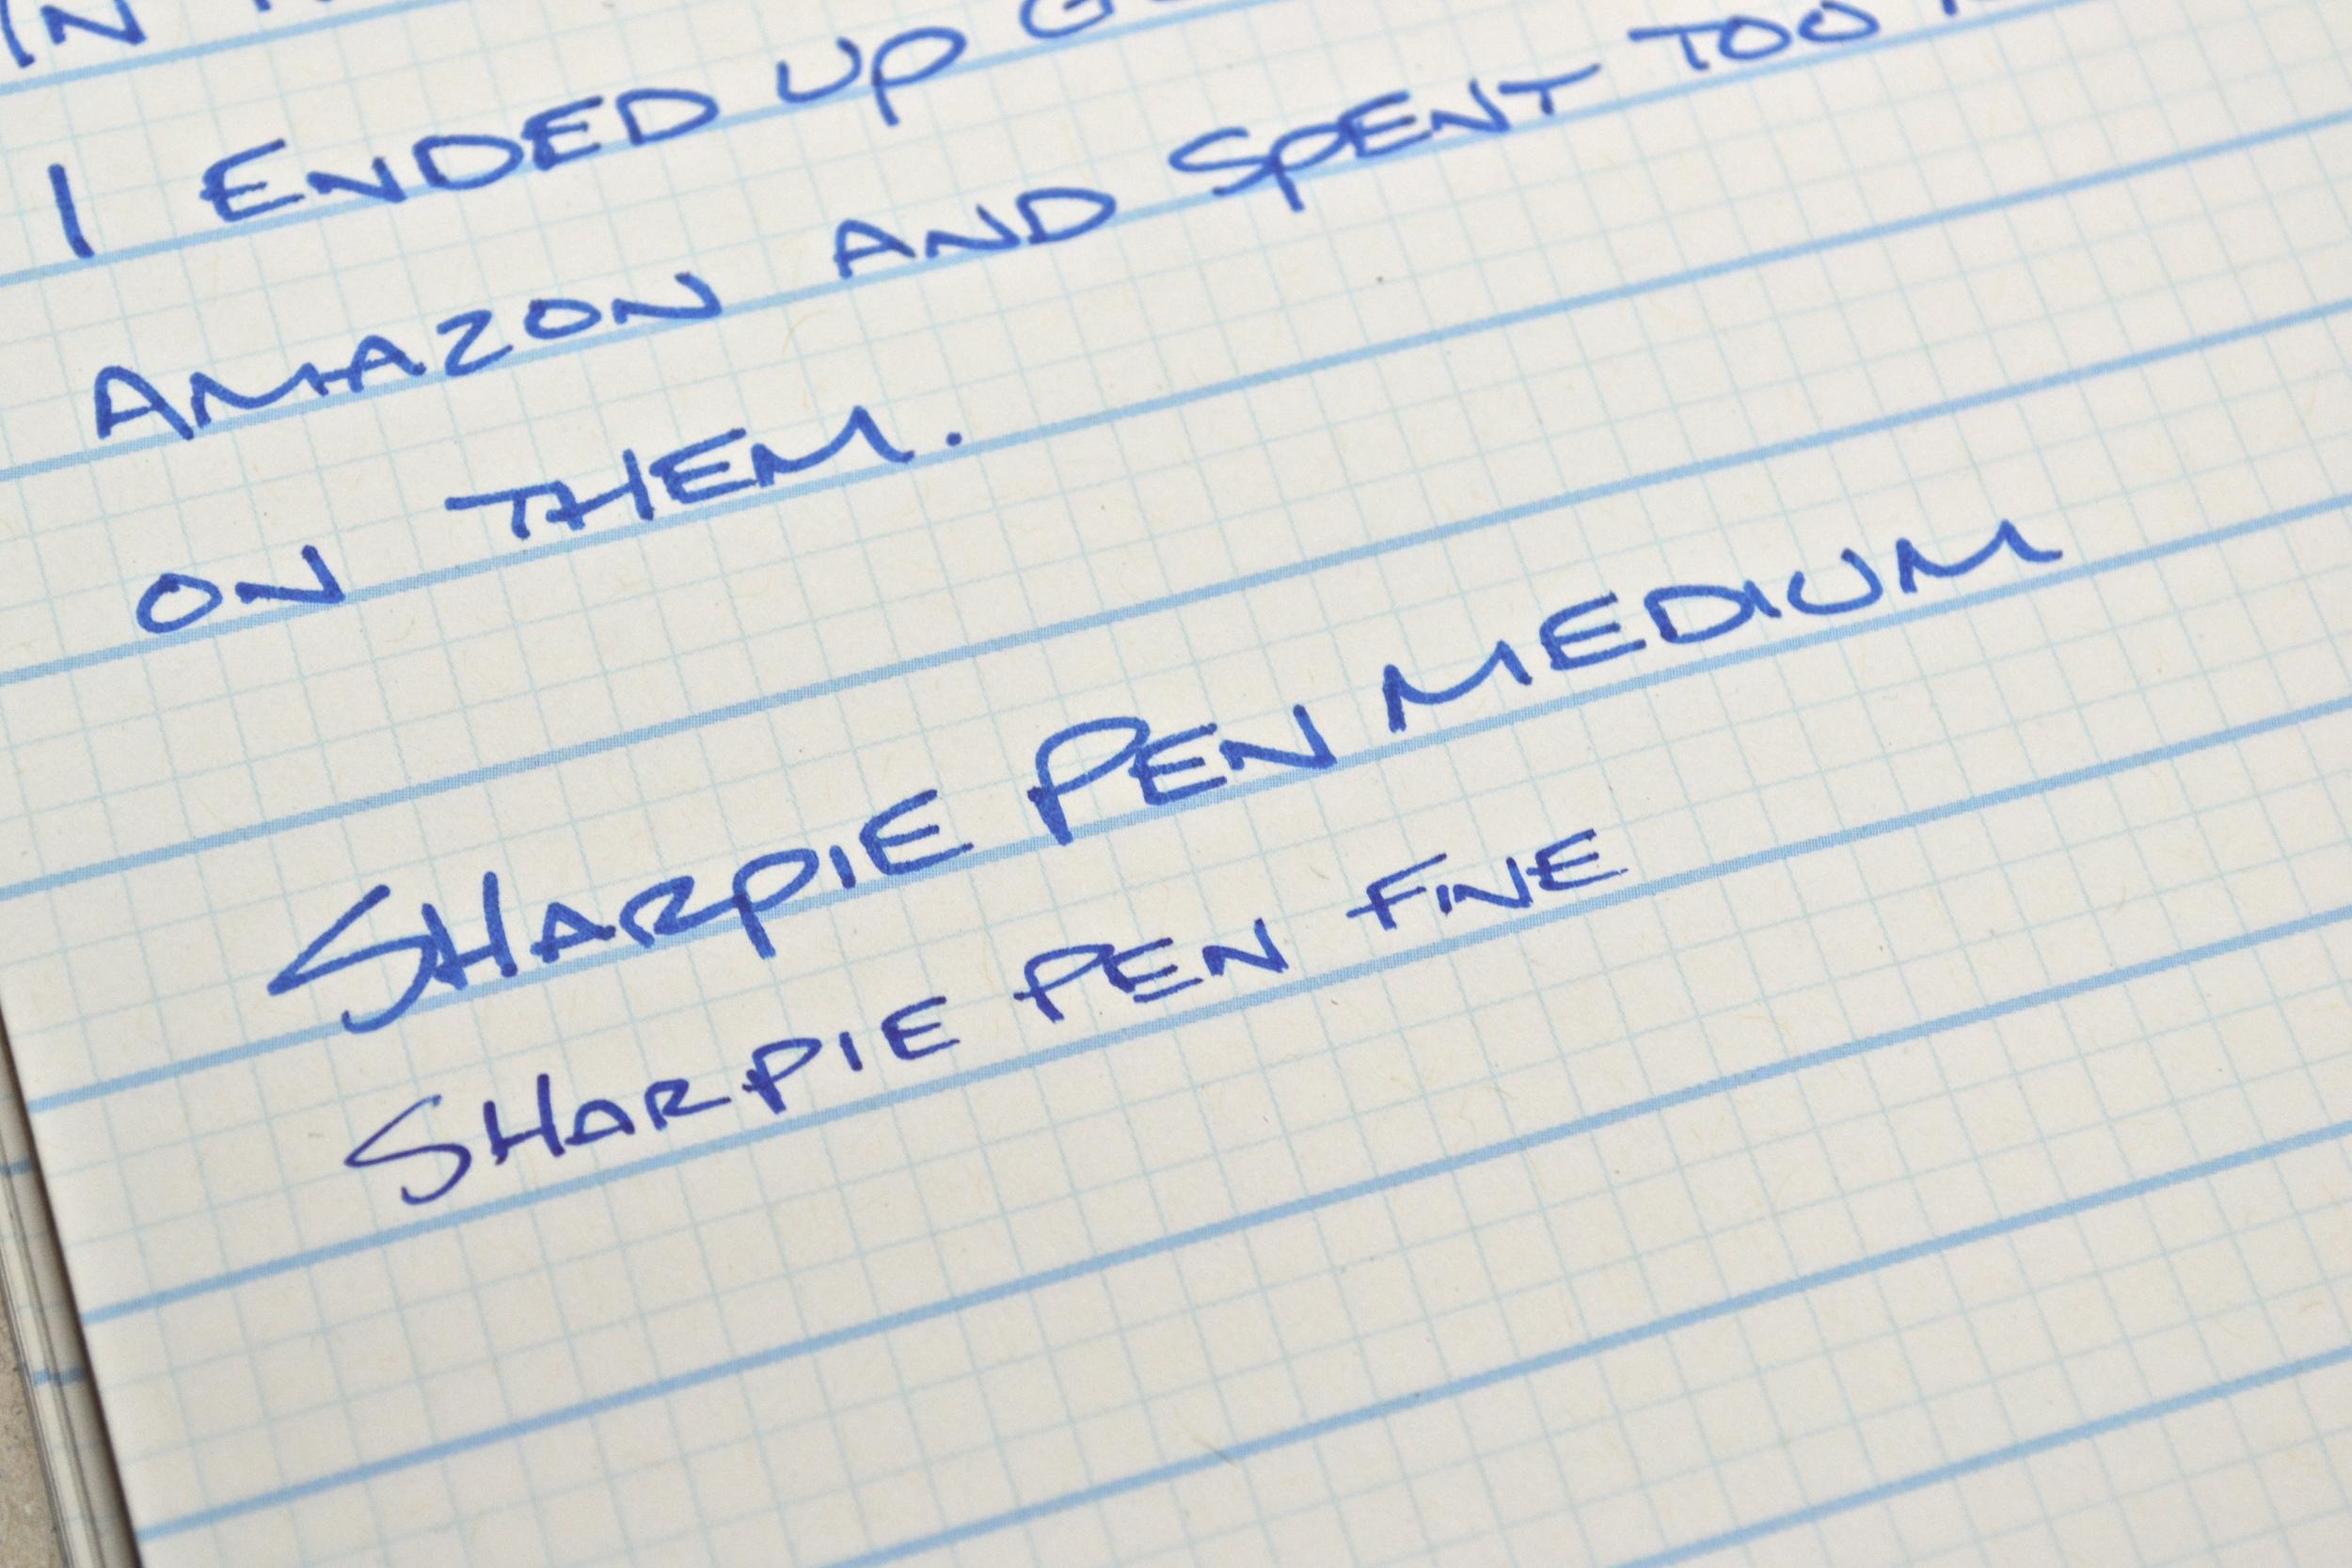 Sharpie Pen Retractable Review On Doane Paper